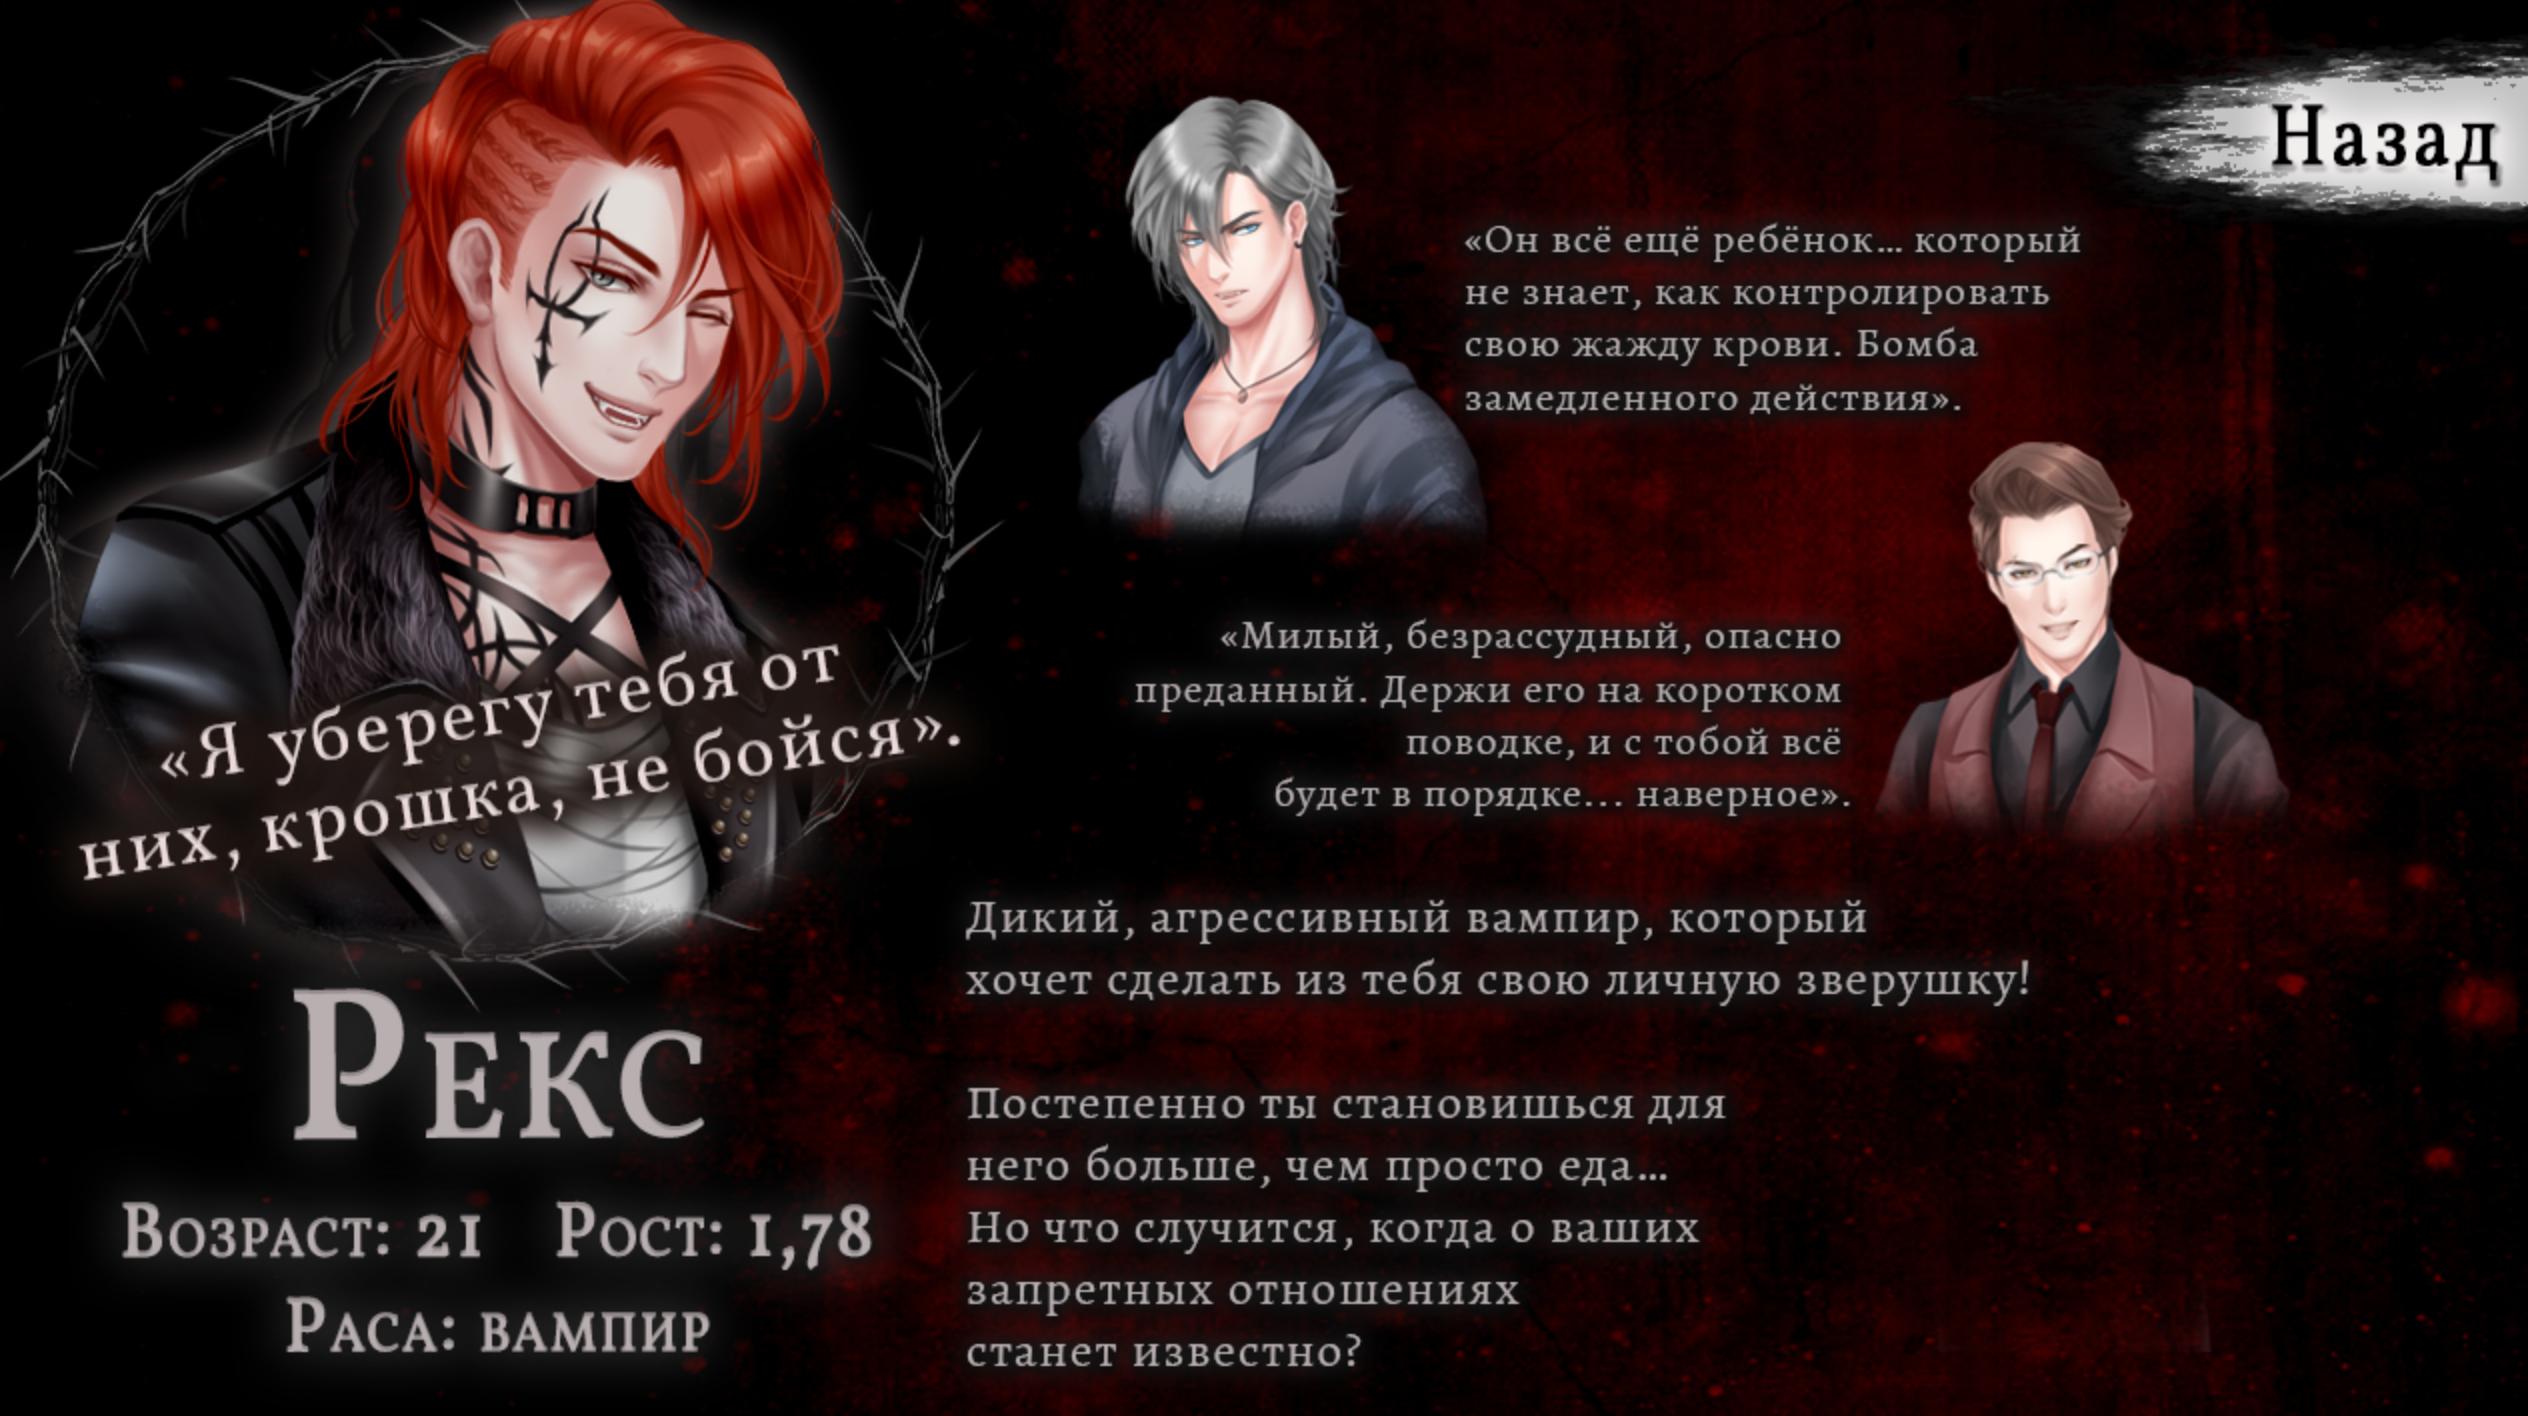 Rex profile card in Russian